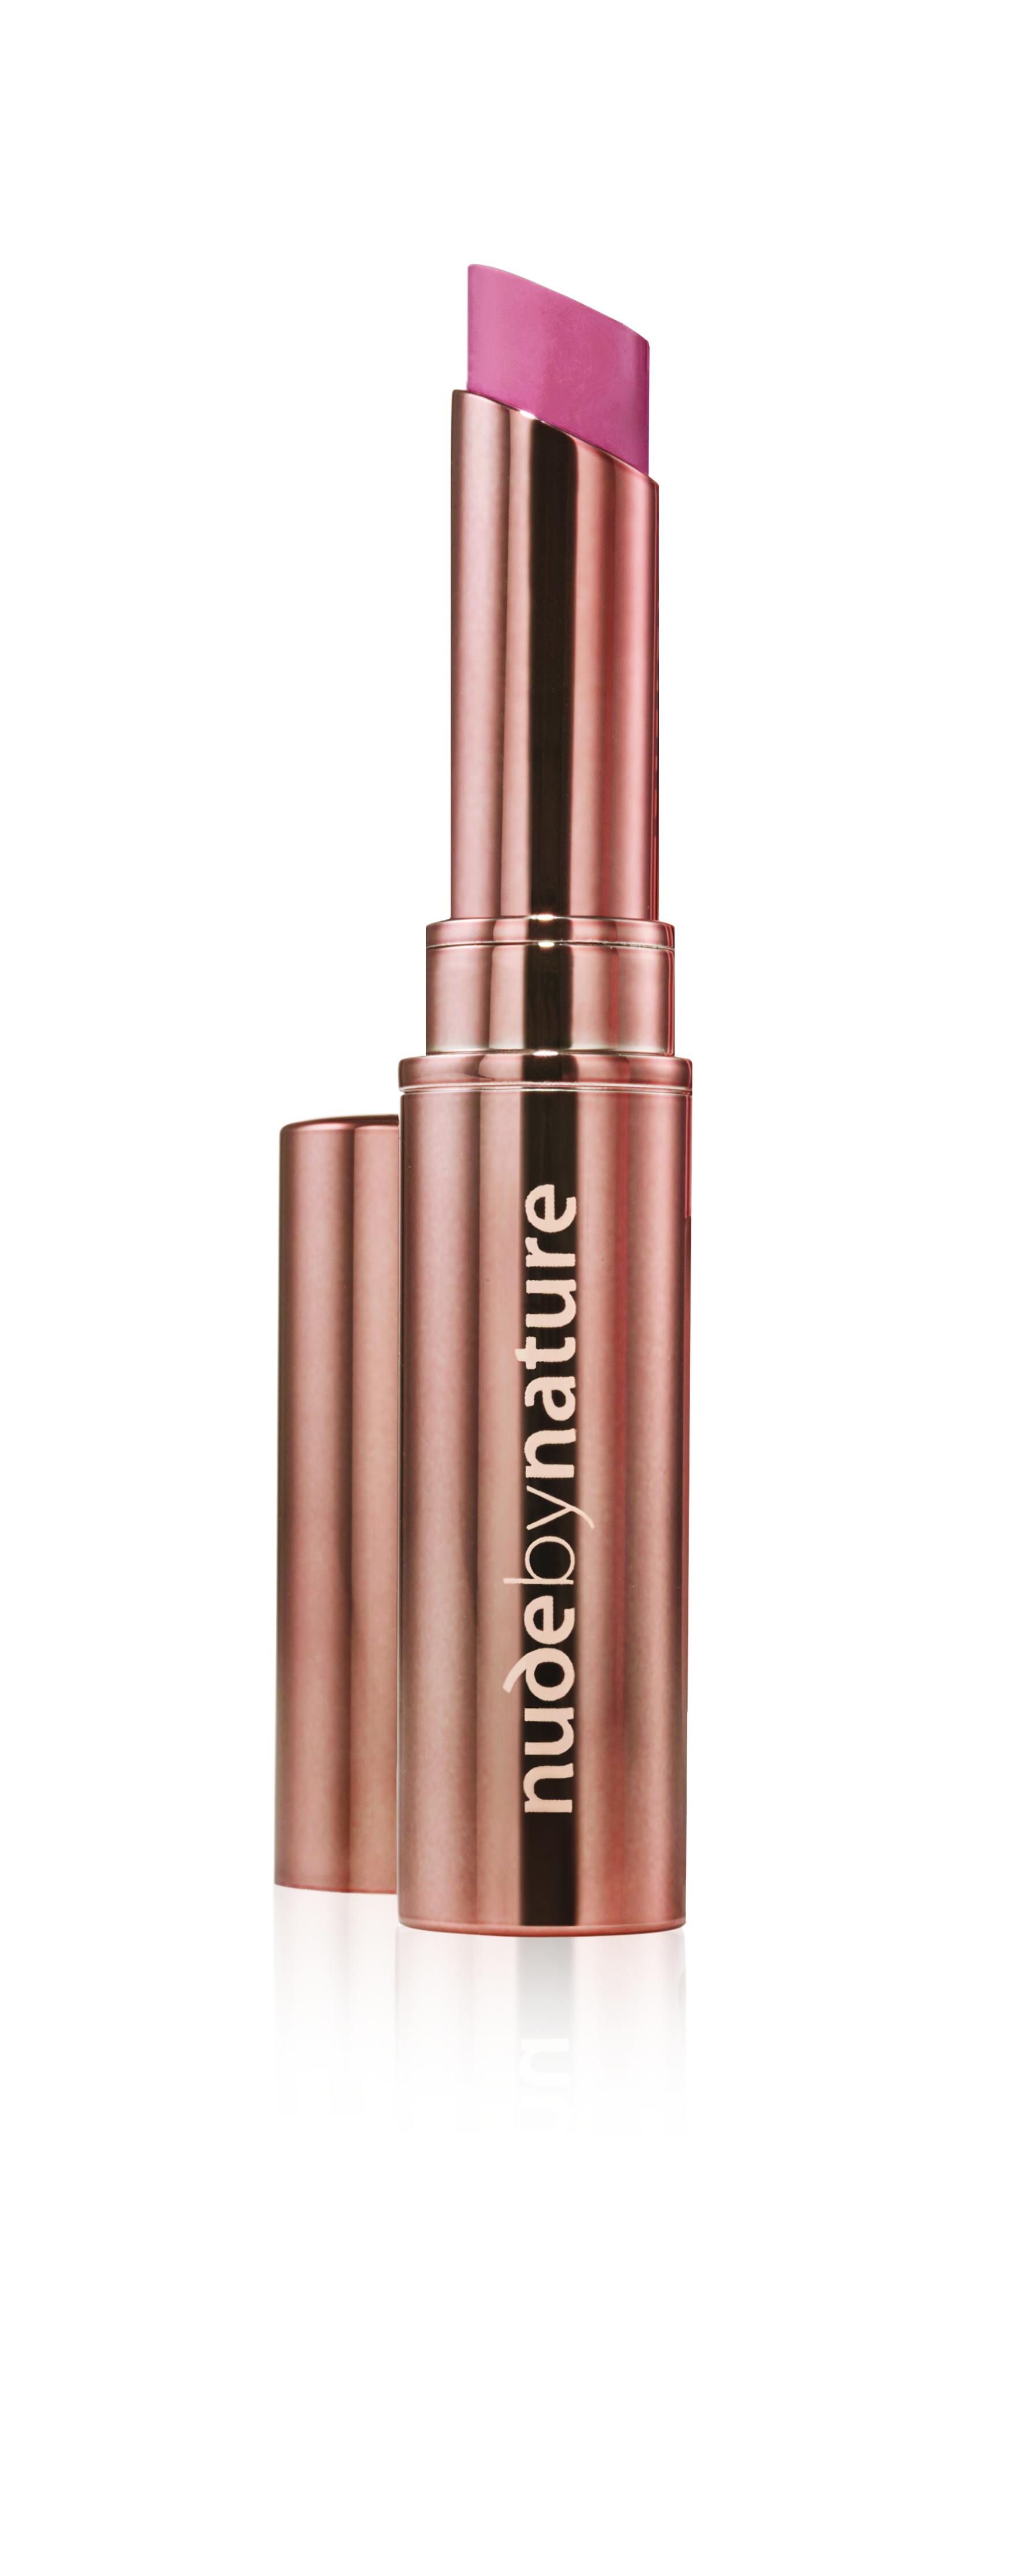 Nude by Nature - Creamy Matte Lipstick - 01 Blush Nude